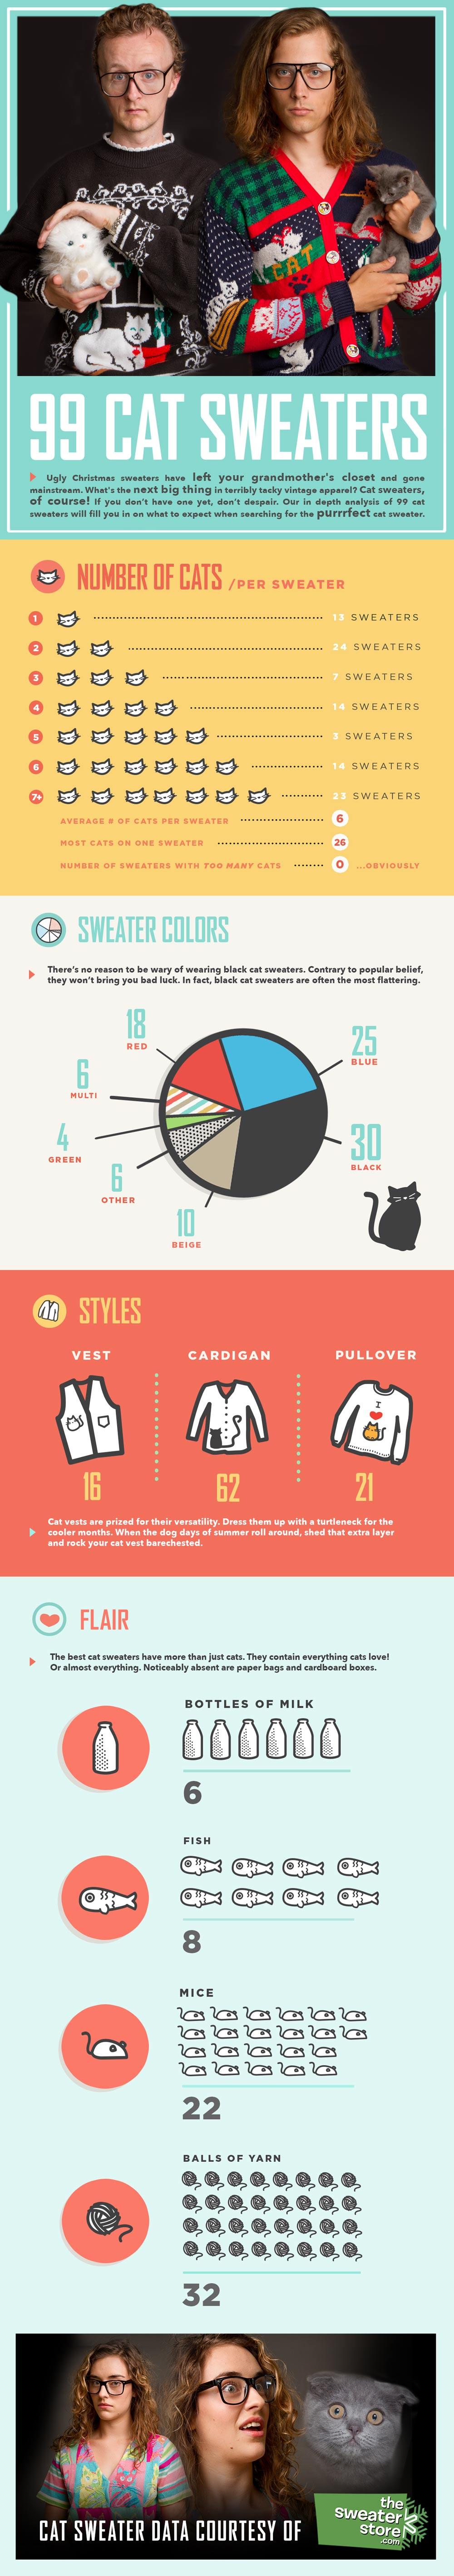 99 Cat Sweaters